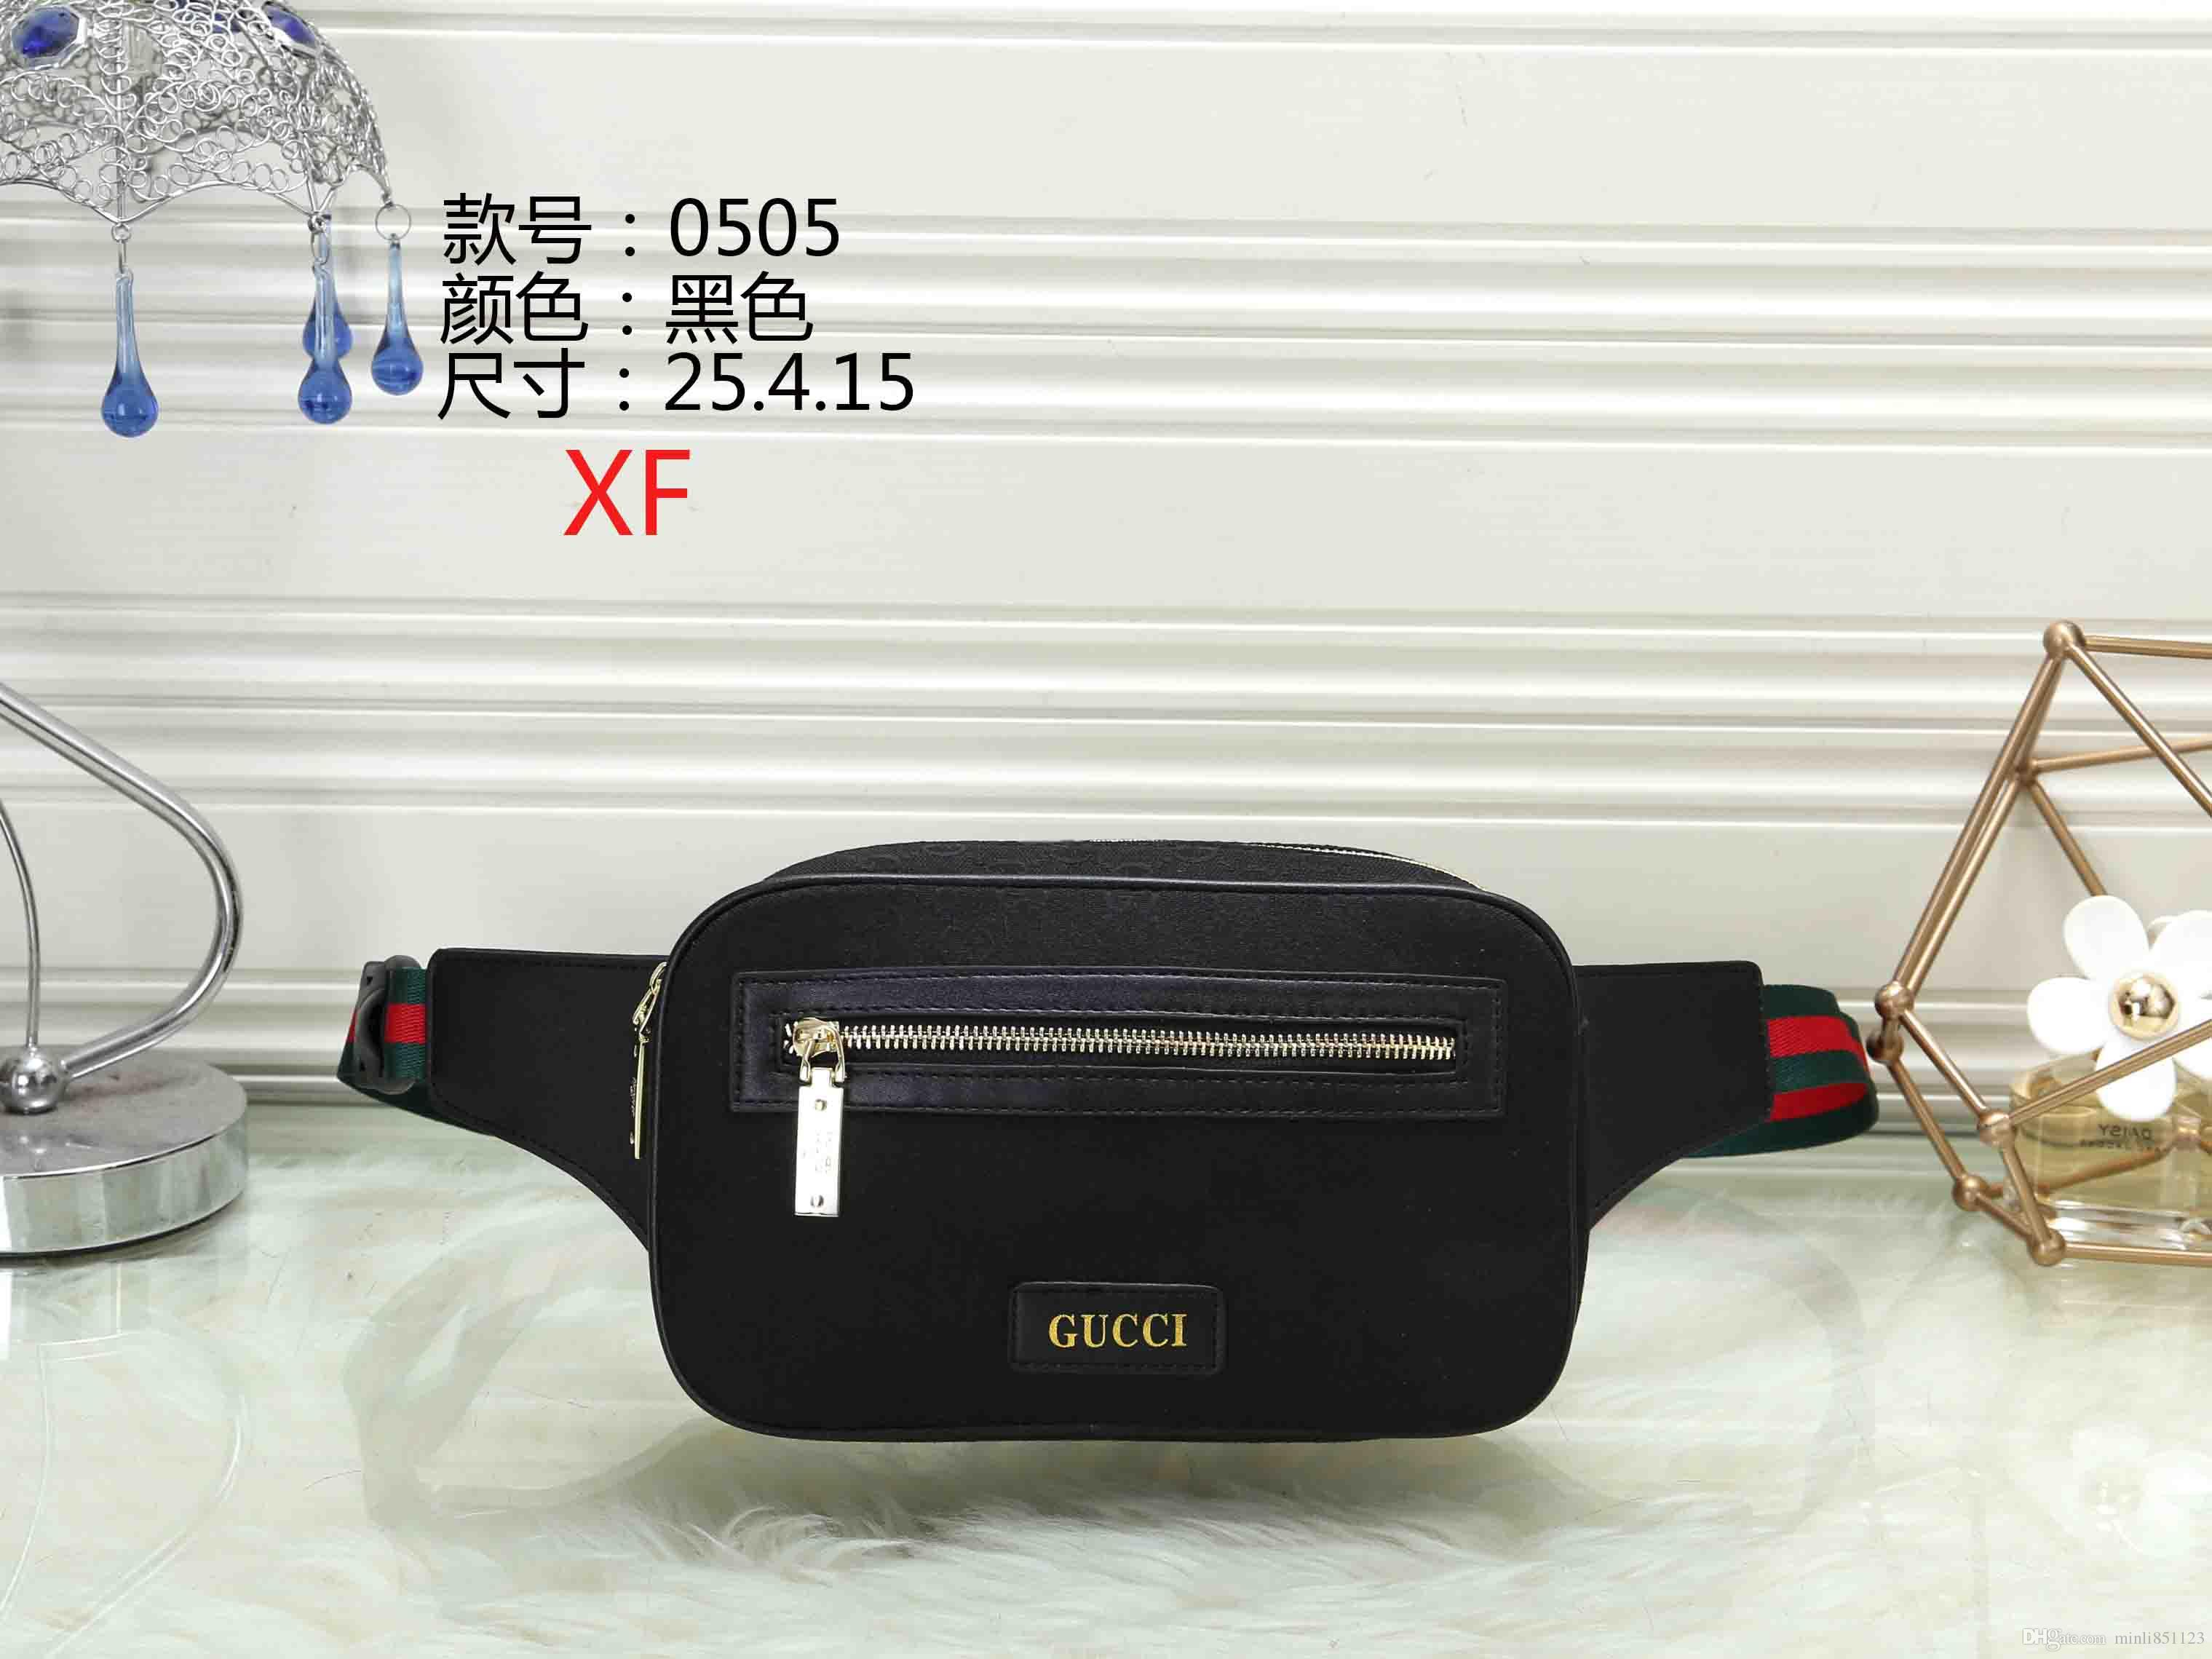 c83b591d97d 2019 Women Waist Bag Famous Brand Belt Bag Men Fanny Pack Designer Men Waist  Pack Pouch Small Graffiti Belly Bags New Style 2G 888695 Womens Purses  Leather ...